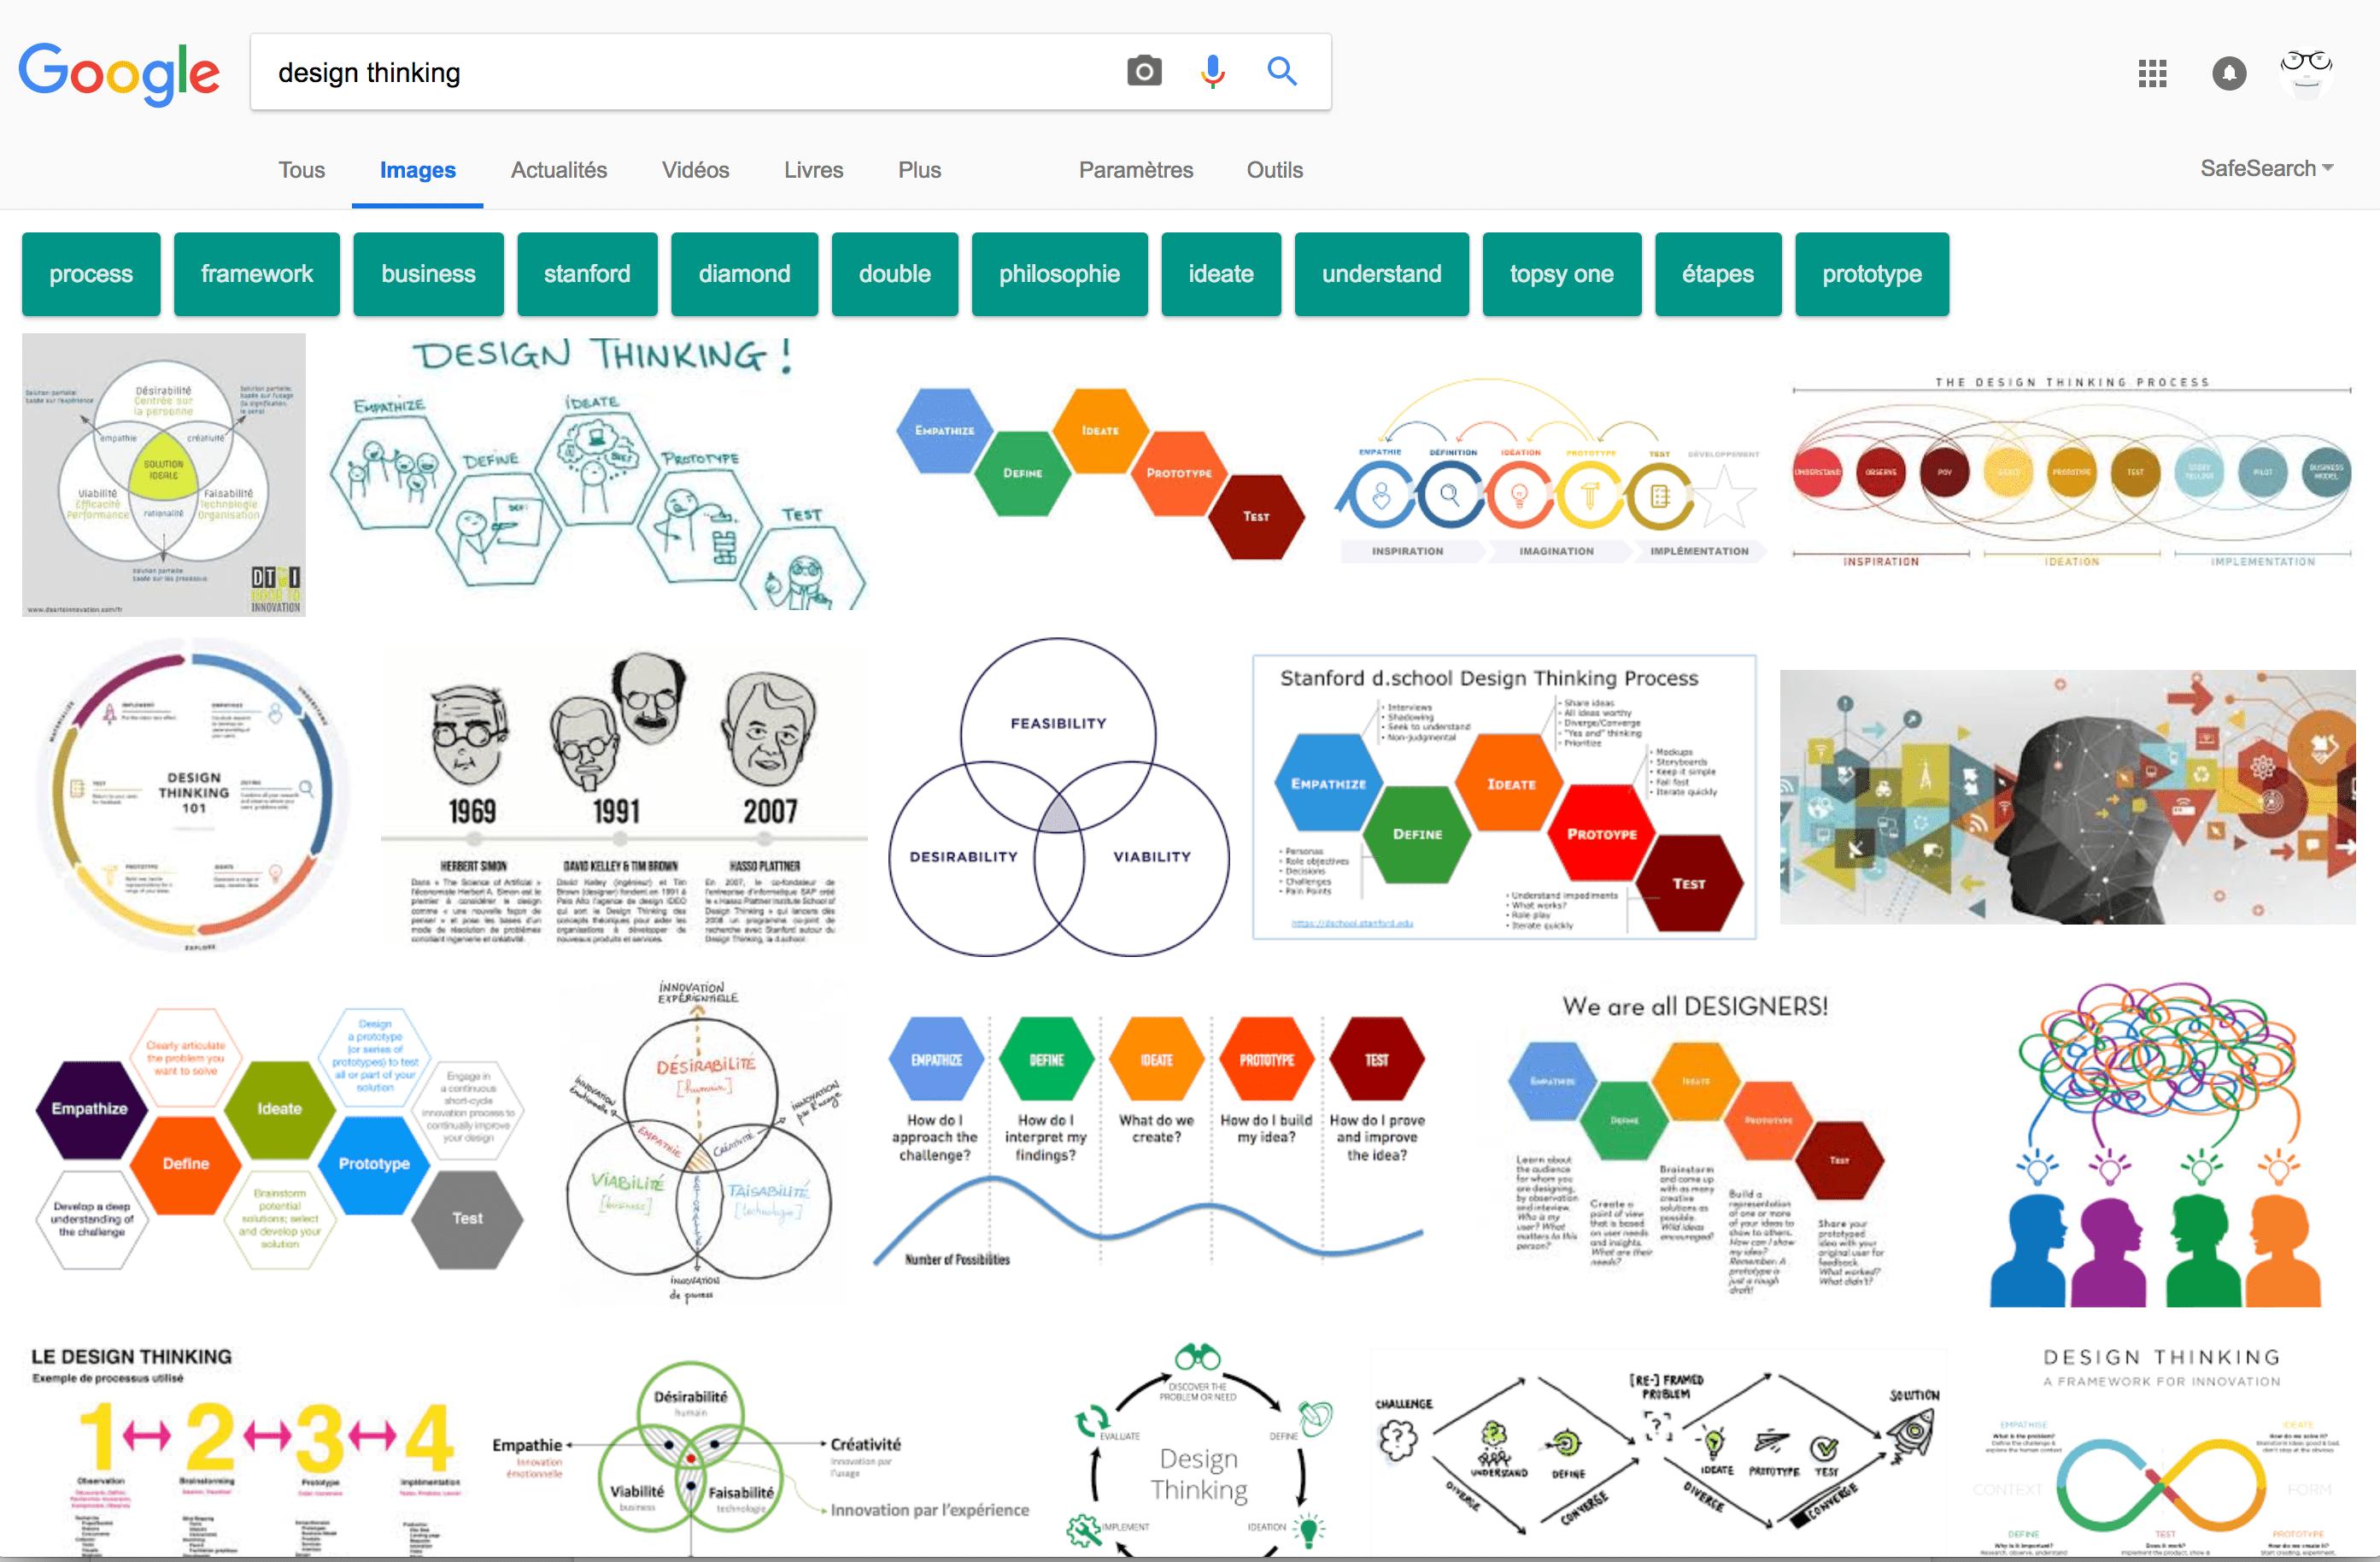 recherche google avec les mots design thinking